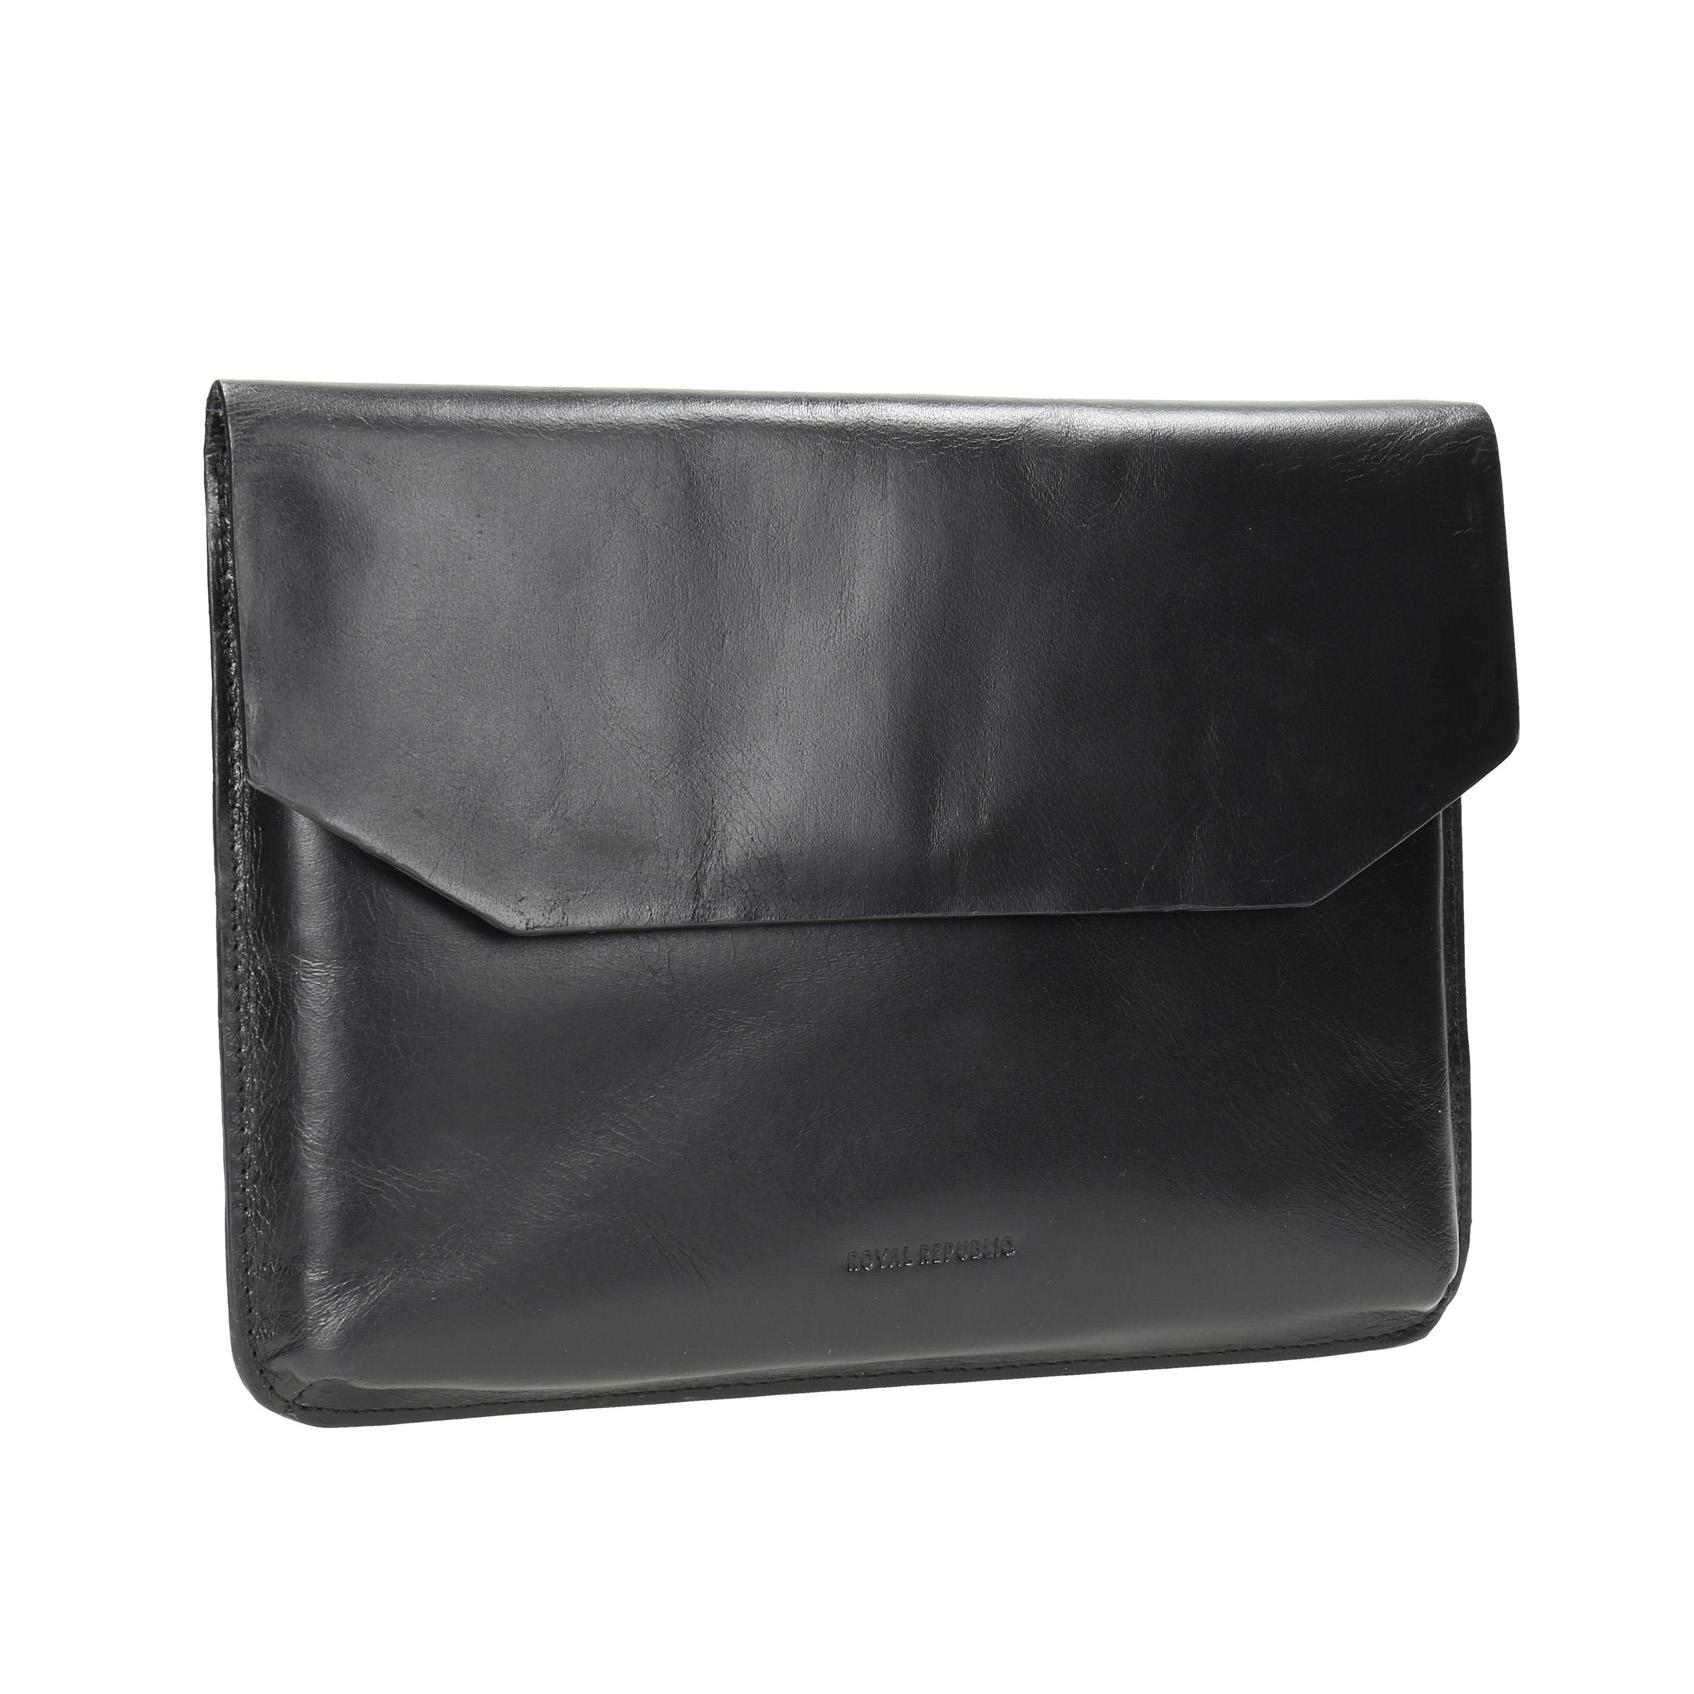 Kožená taška na dokumenty